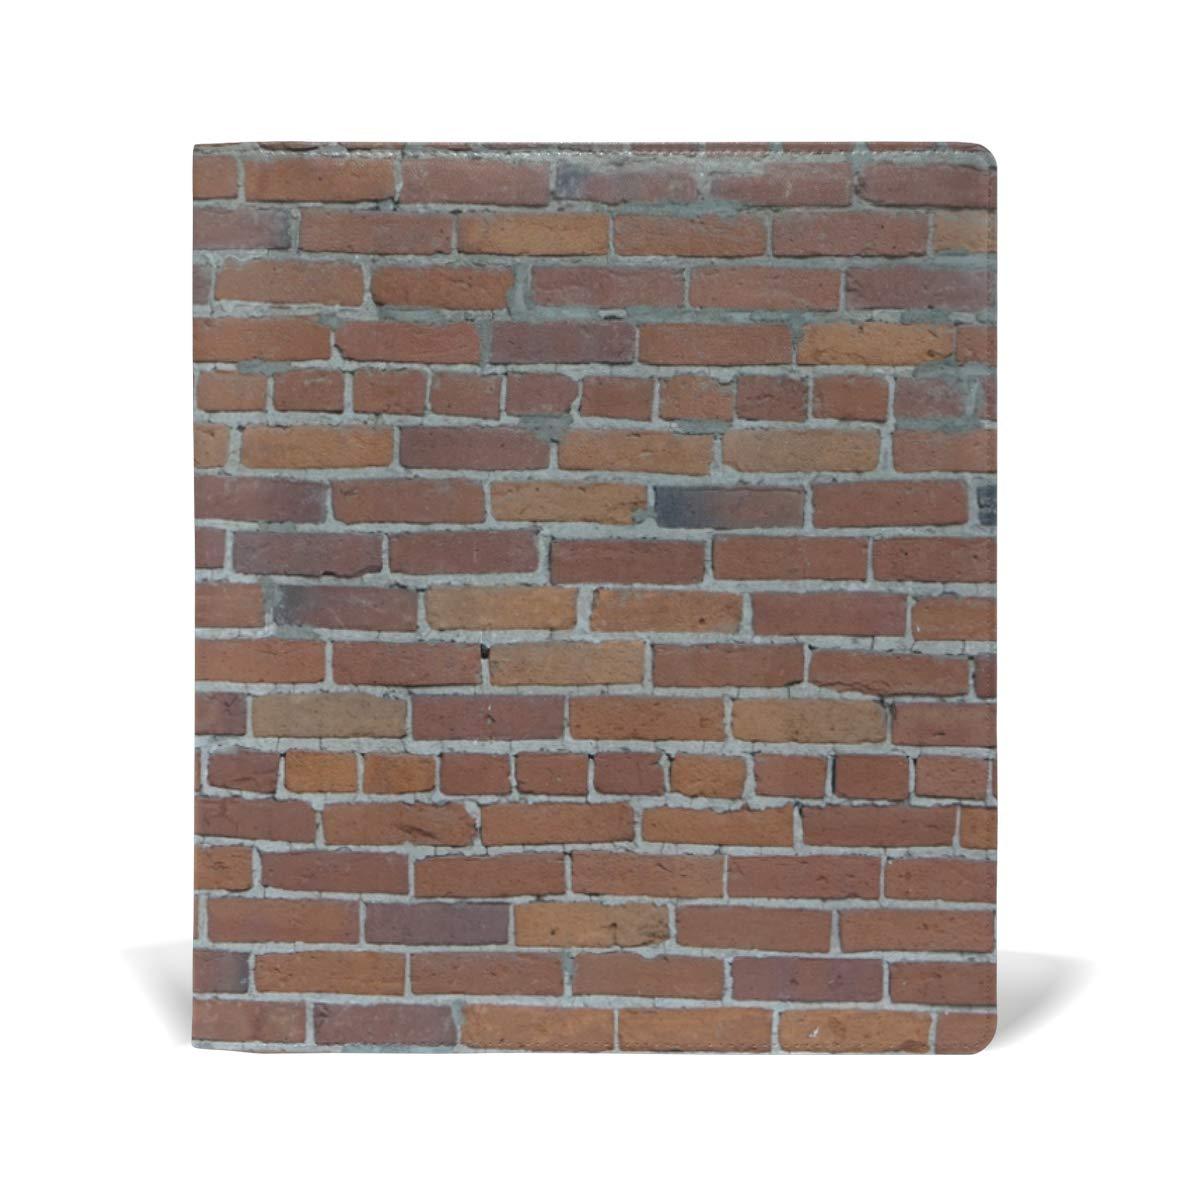 FAJRO- Fundas para libros de pared de alinear, ladrillo sin alinear, de tamaño estándar de hasta 9 x 11 pulgadas 340bb2